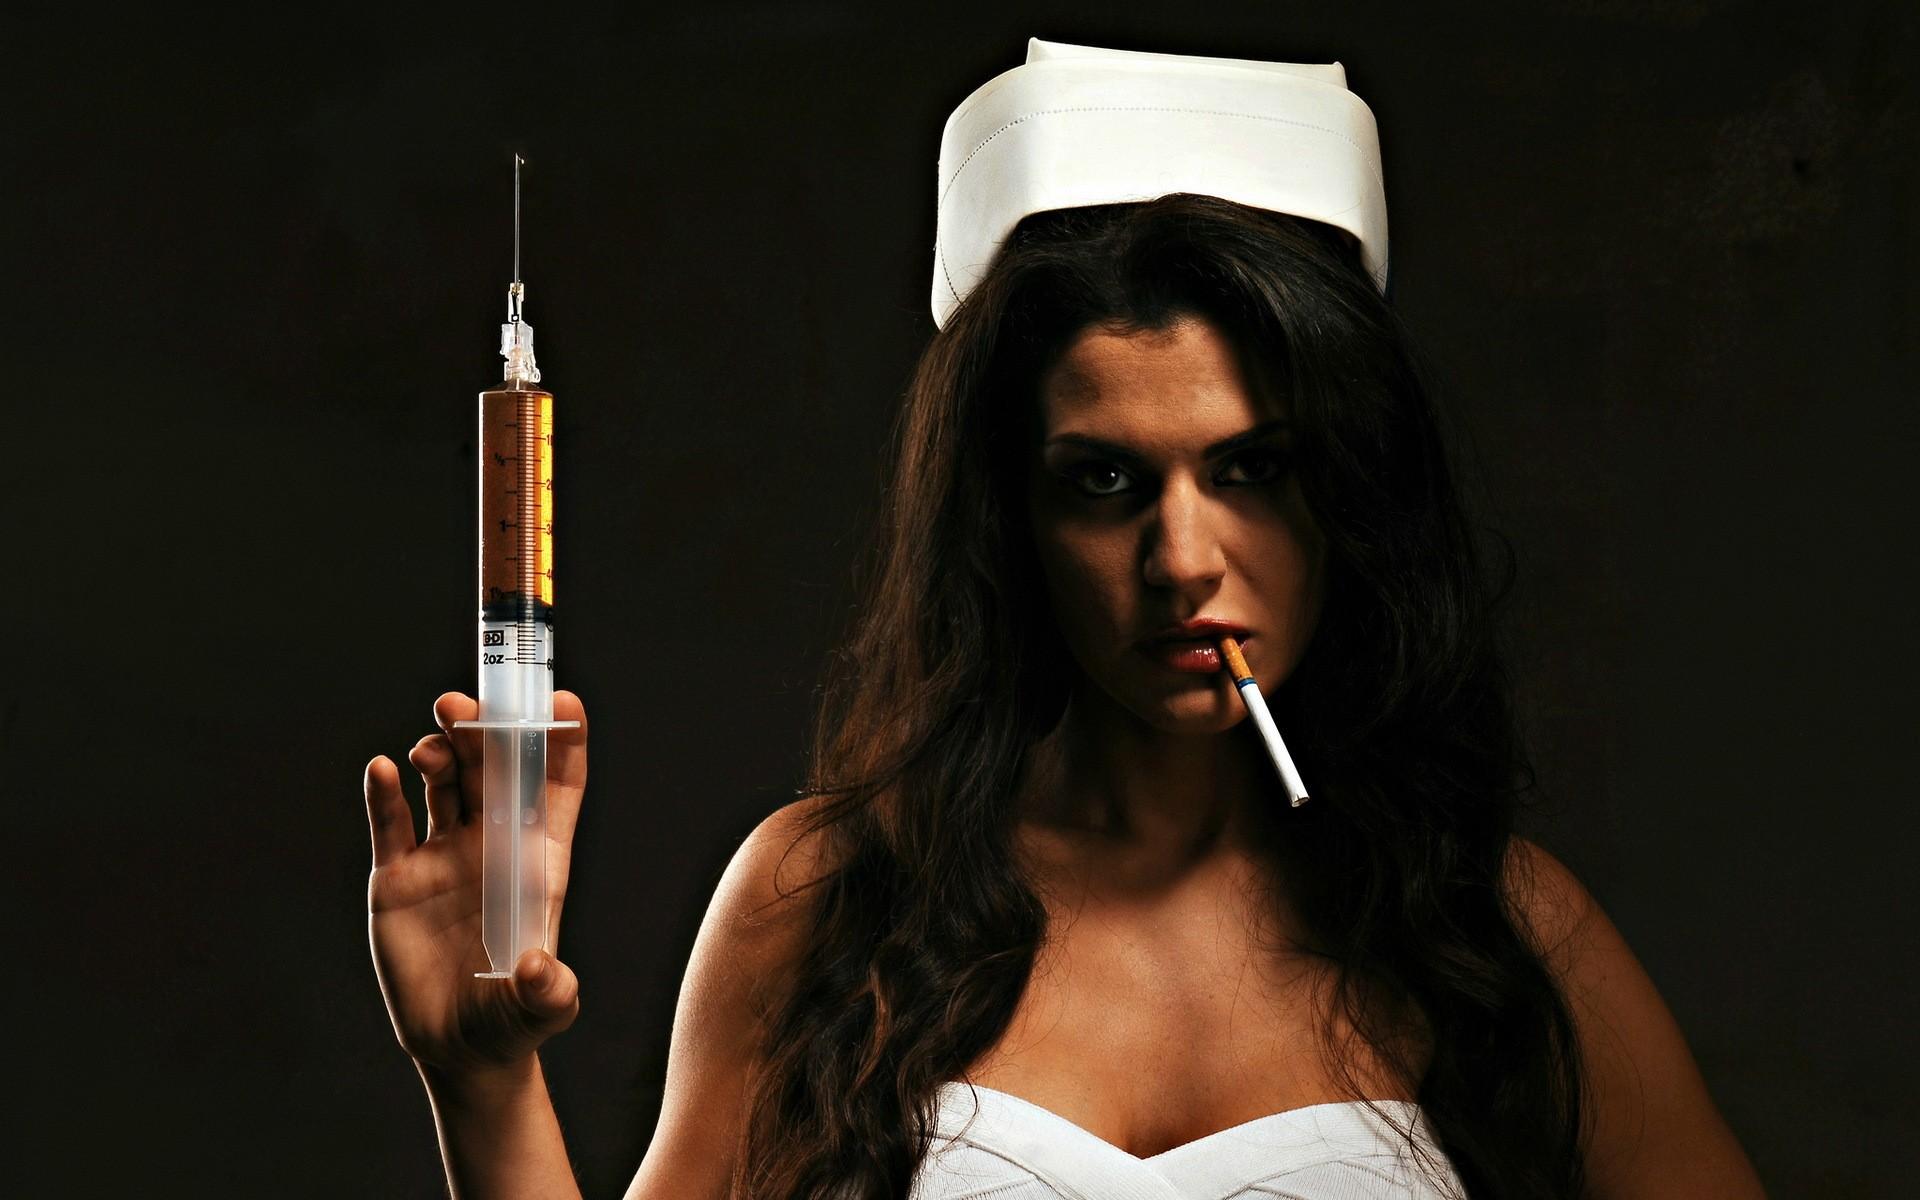 People 1920x1200 nurses cigarettes women model needles smoking